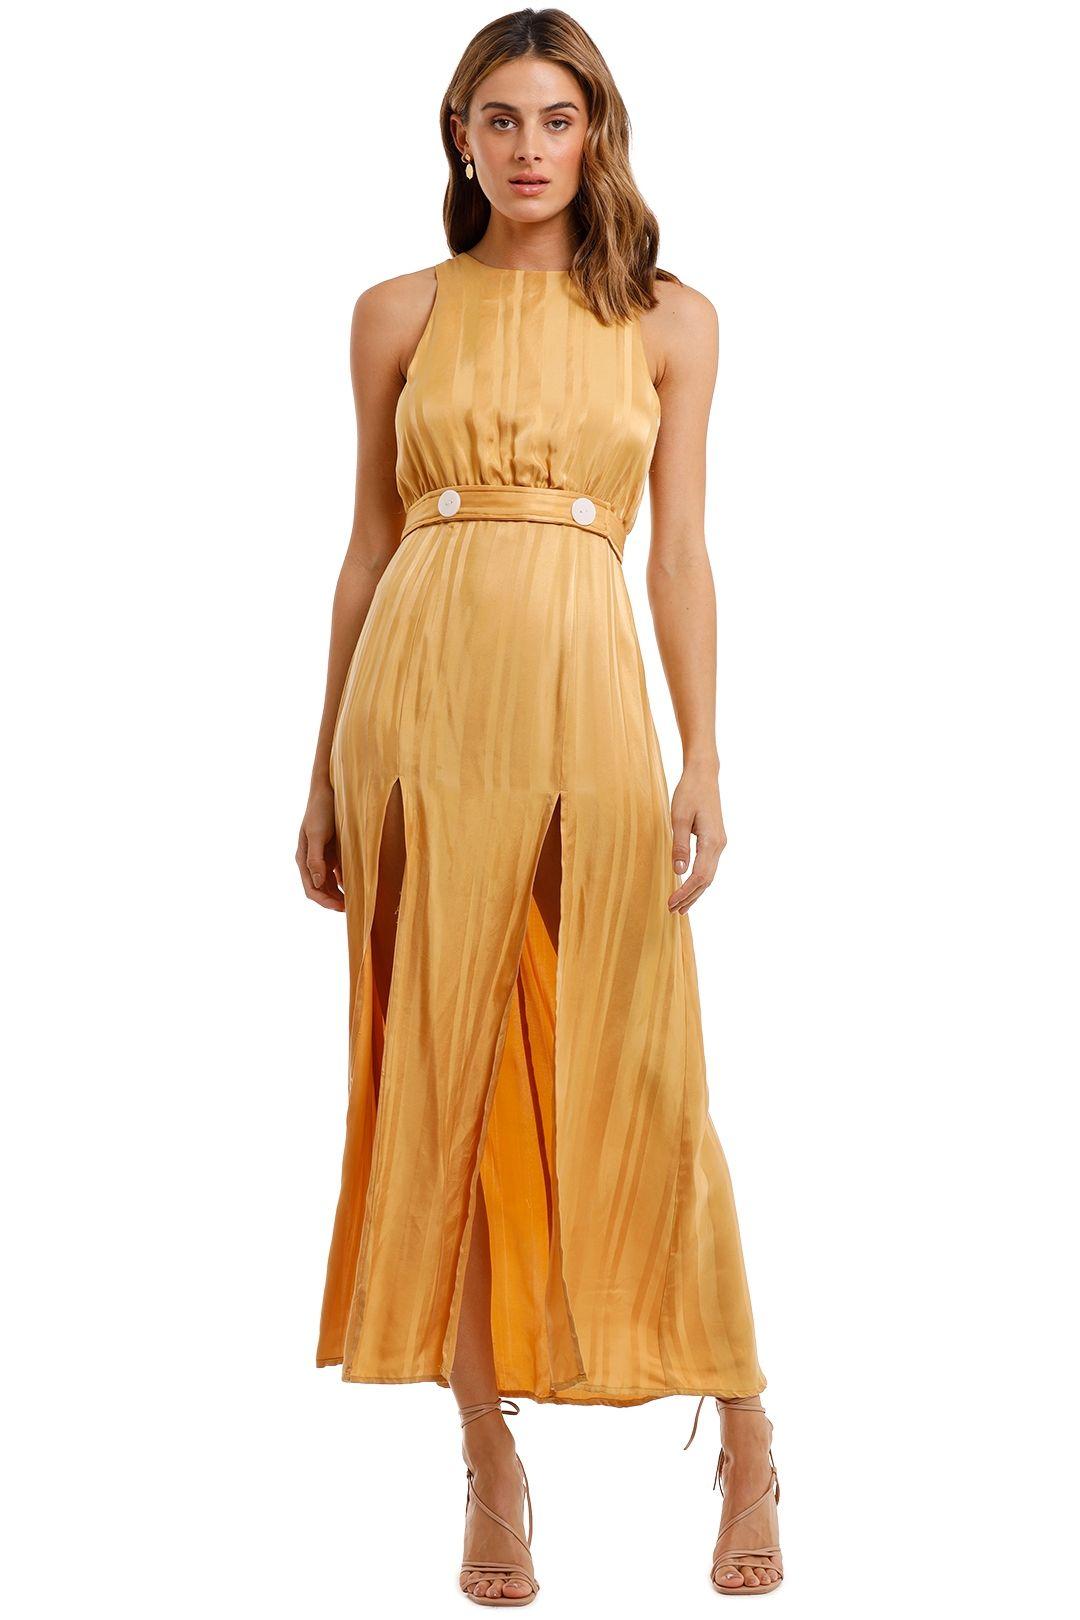 Shona Joy Split Skirt Midi Dress split